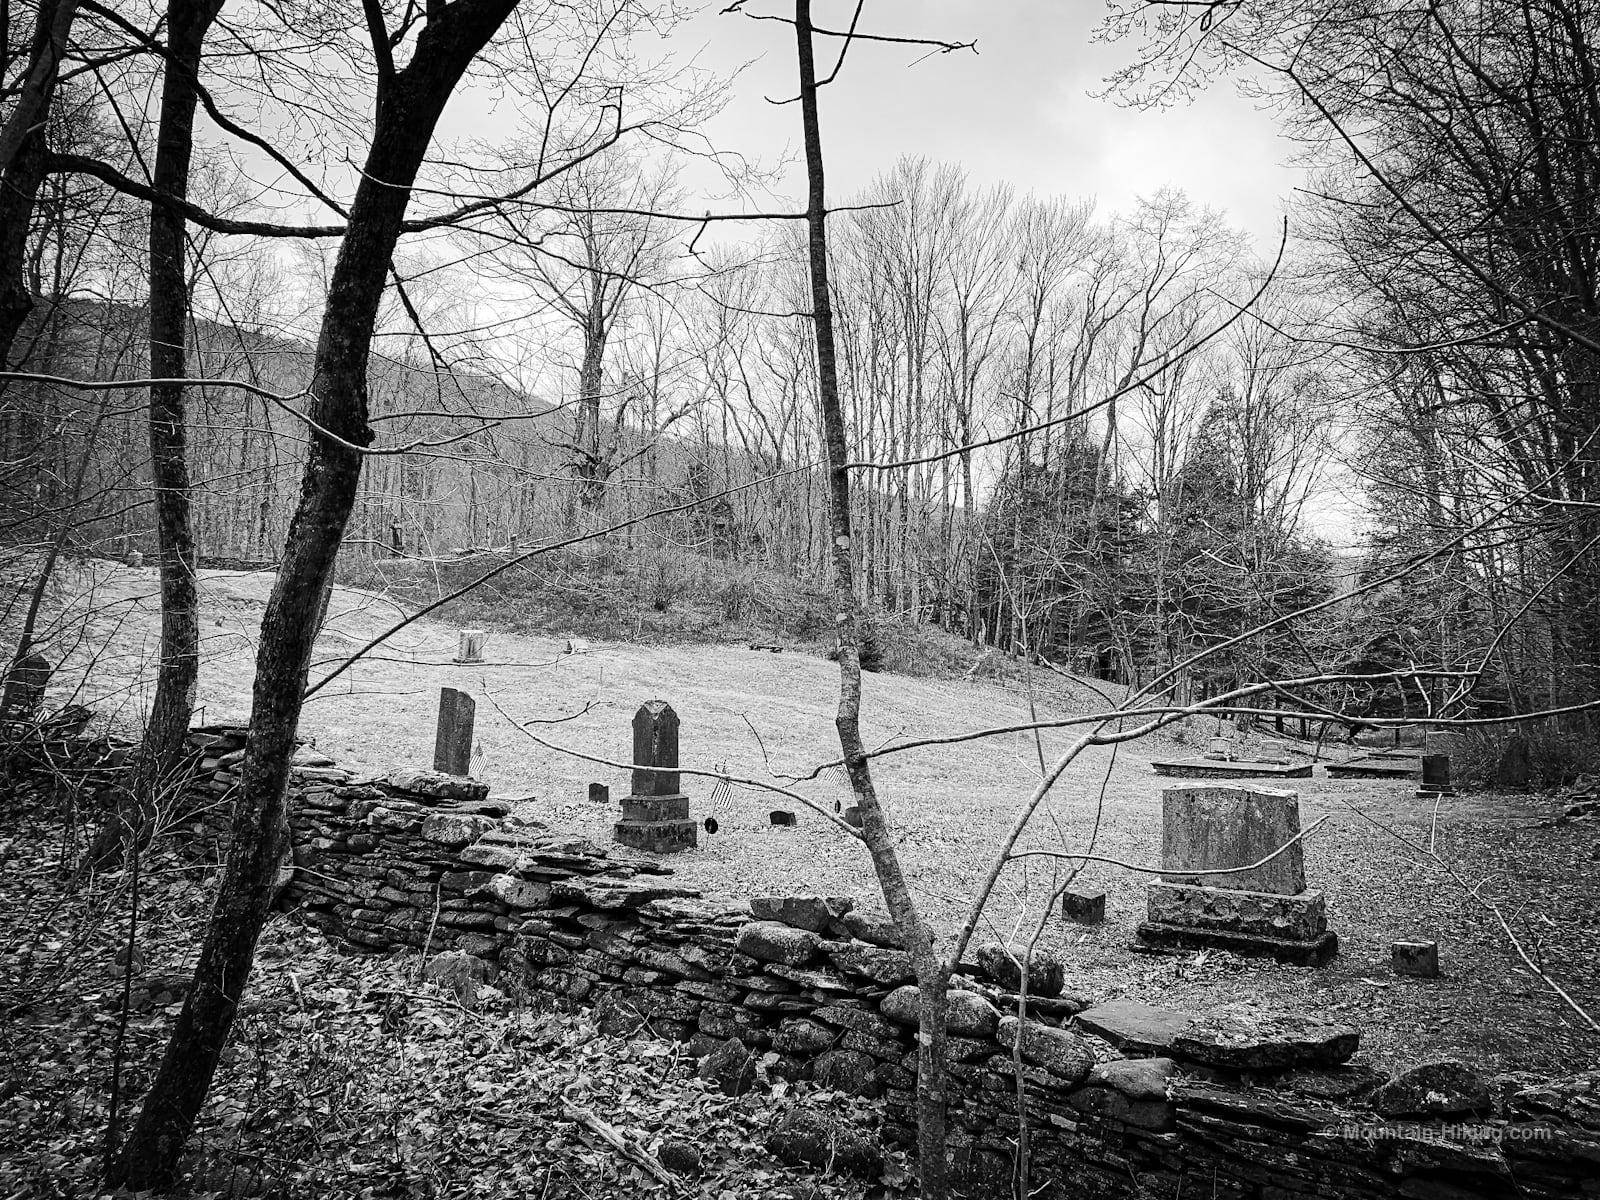 cemetery and headstones